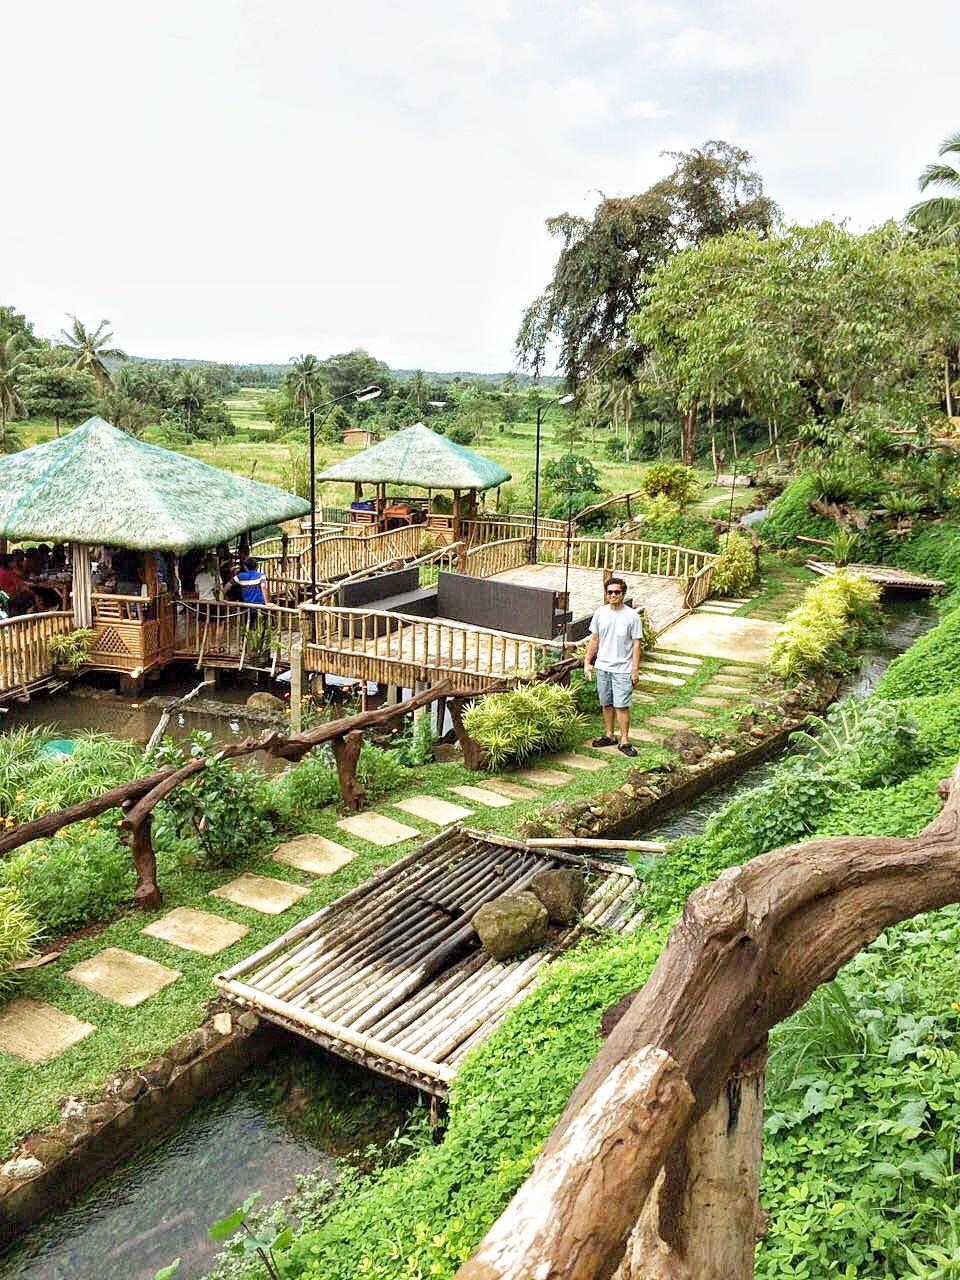 Lonely Travelogue: Samkara Restaurant and Garden Resort: A Hidden ...